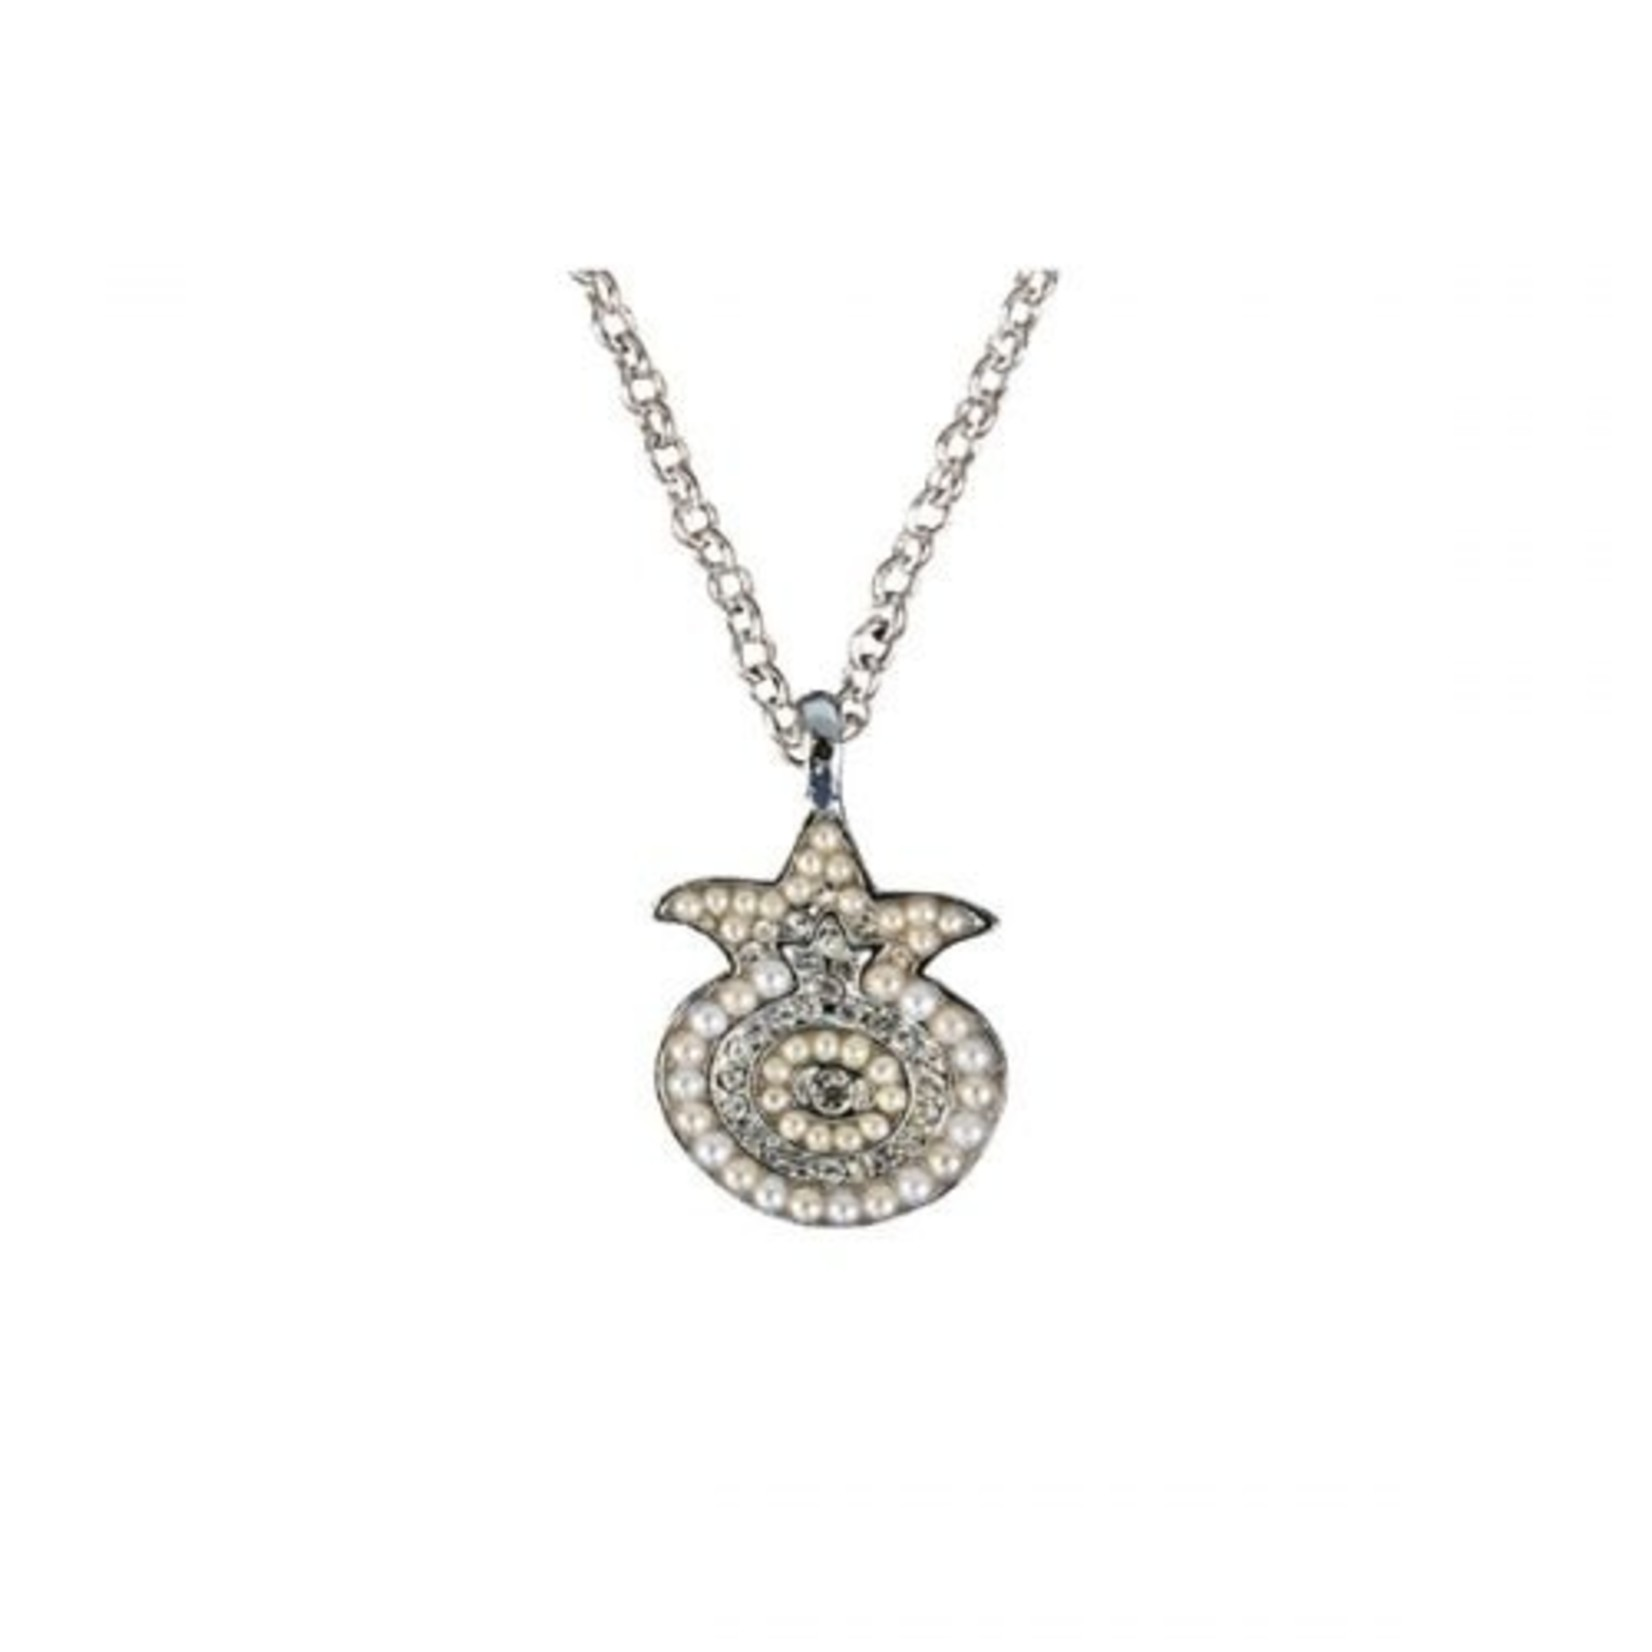 Necklace, Pomegranate with Swarovski Crystals